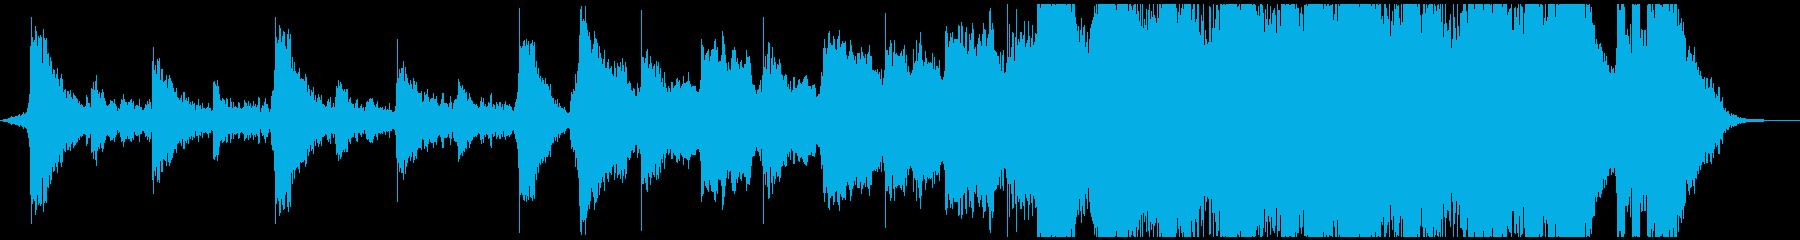 Strike VIIの再生済みの波形